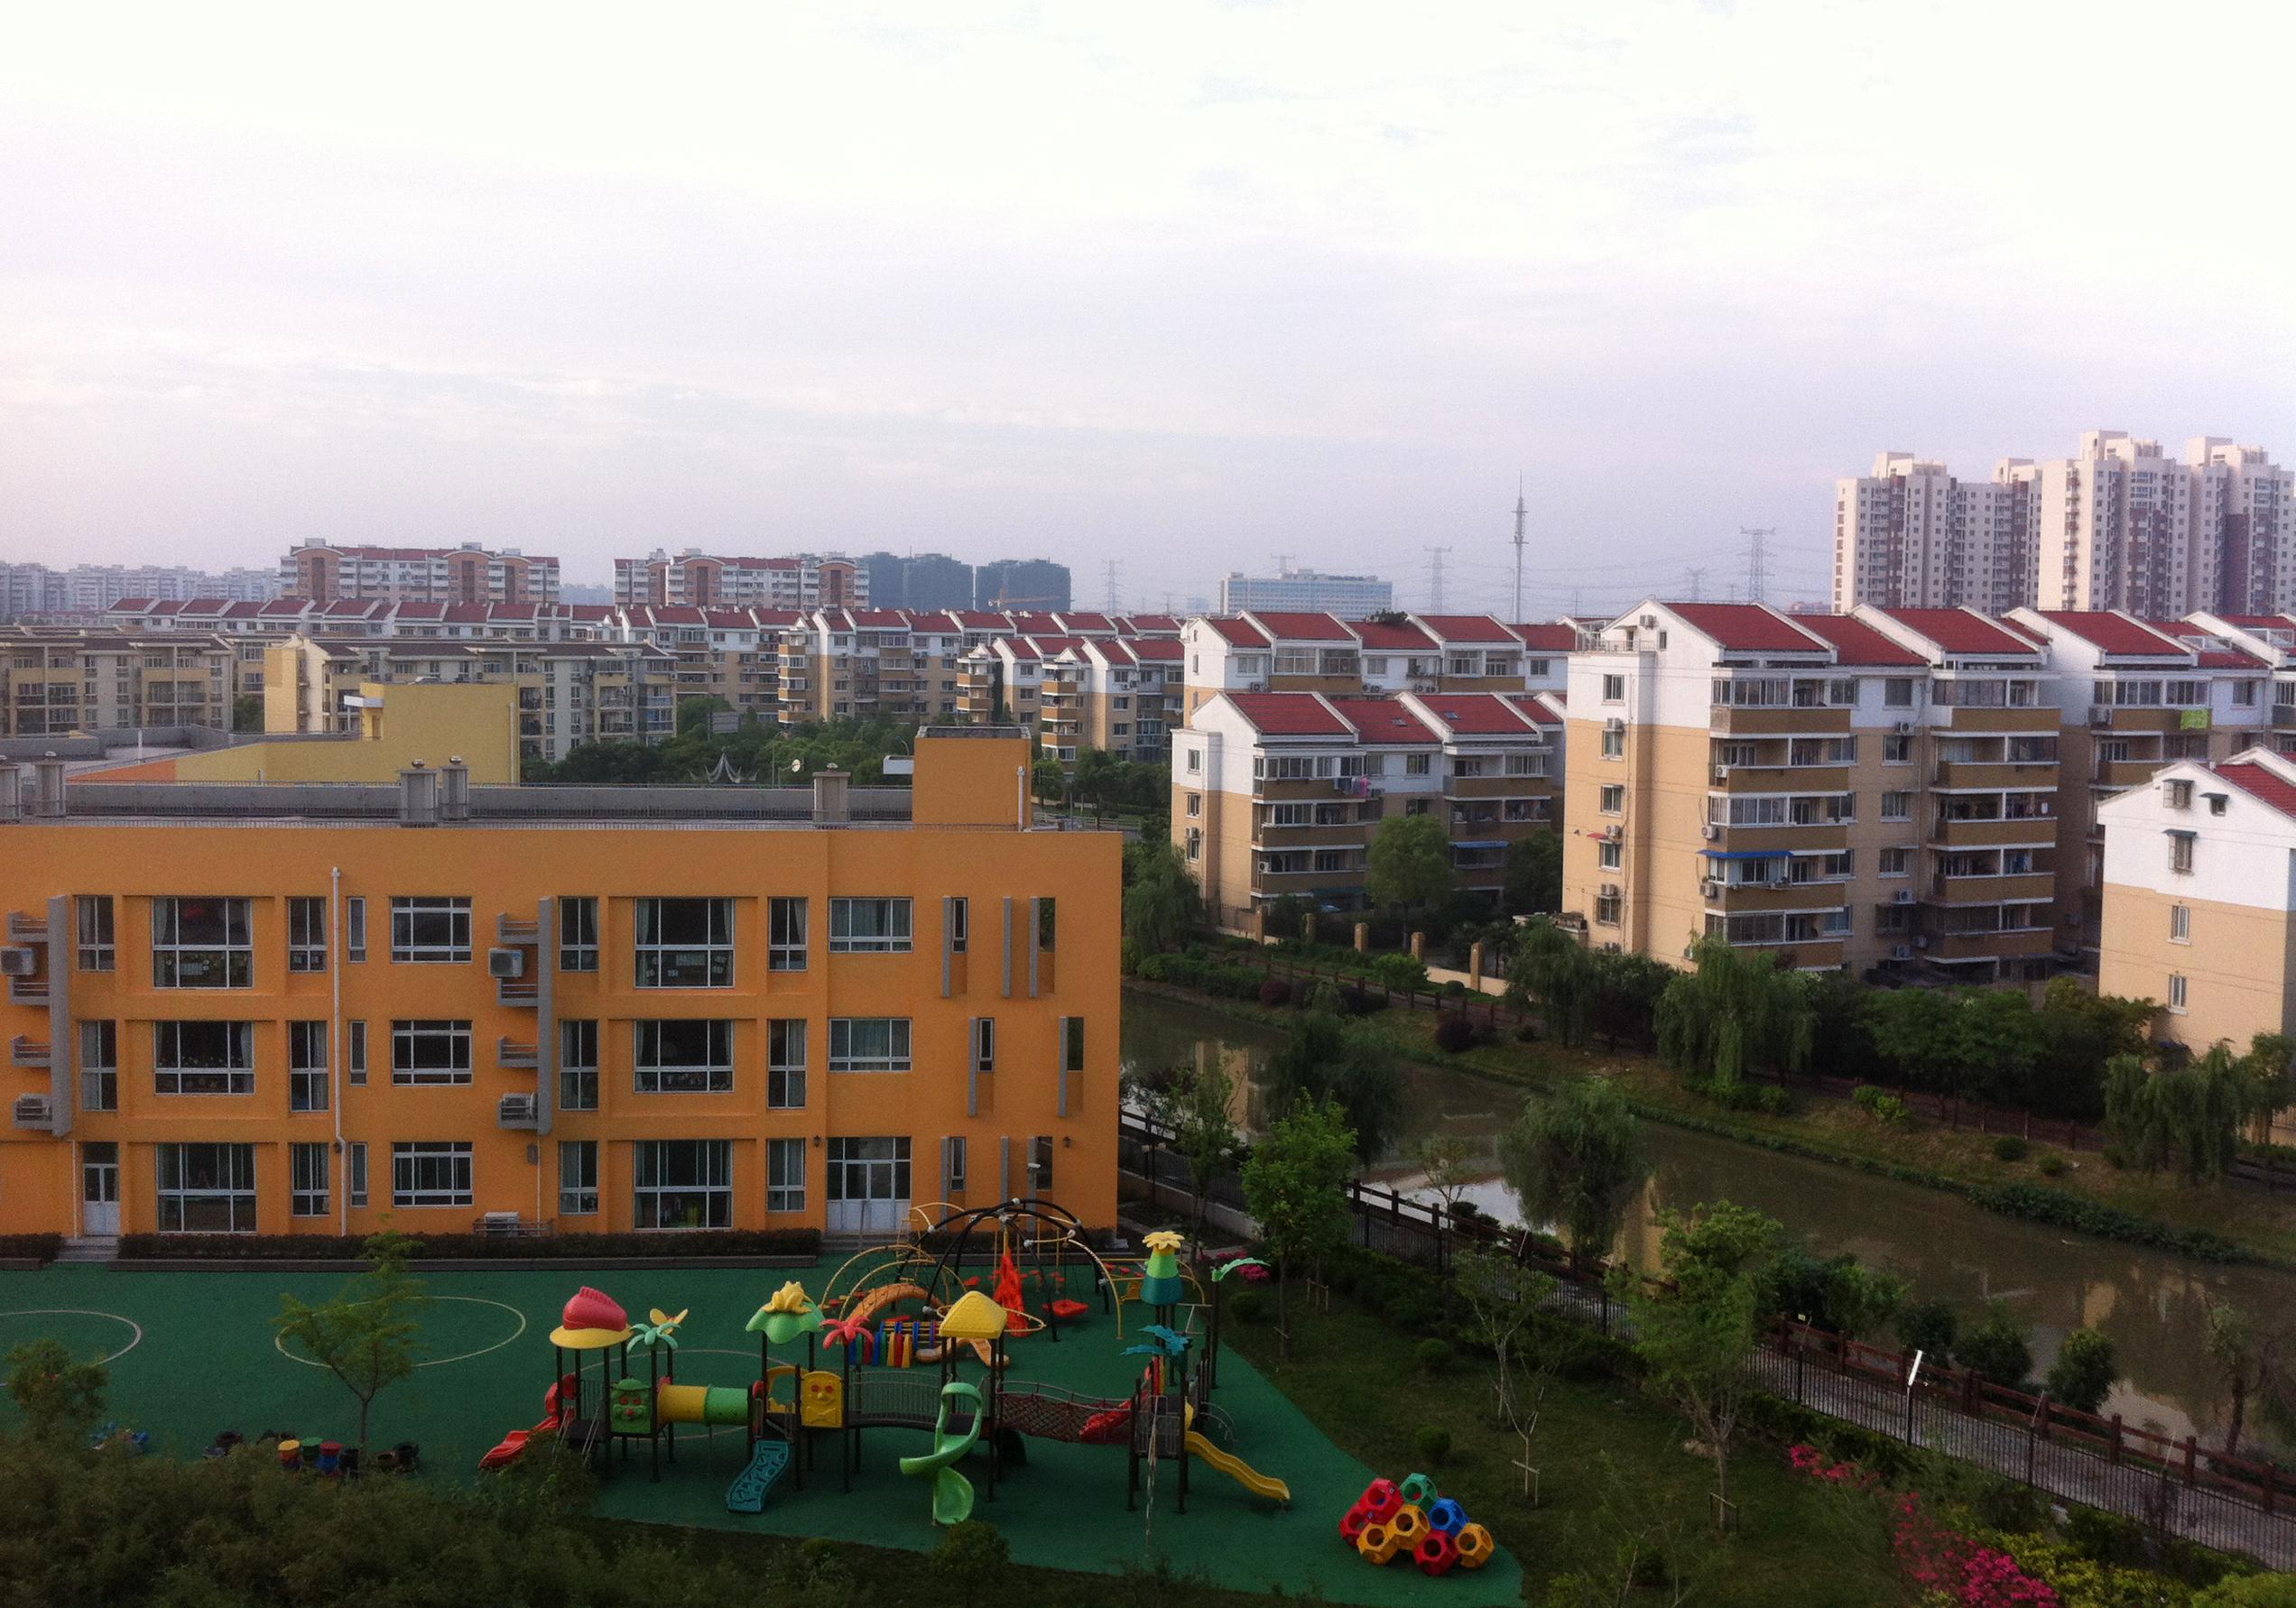 Concrete Floors! No Working Toilet! Just $200K In Shanghai